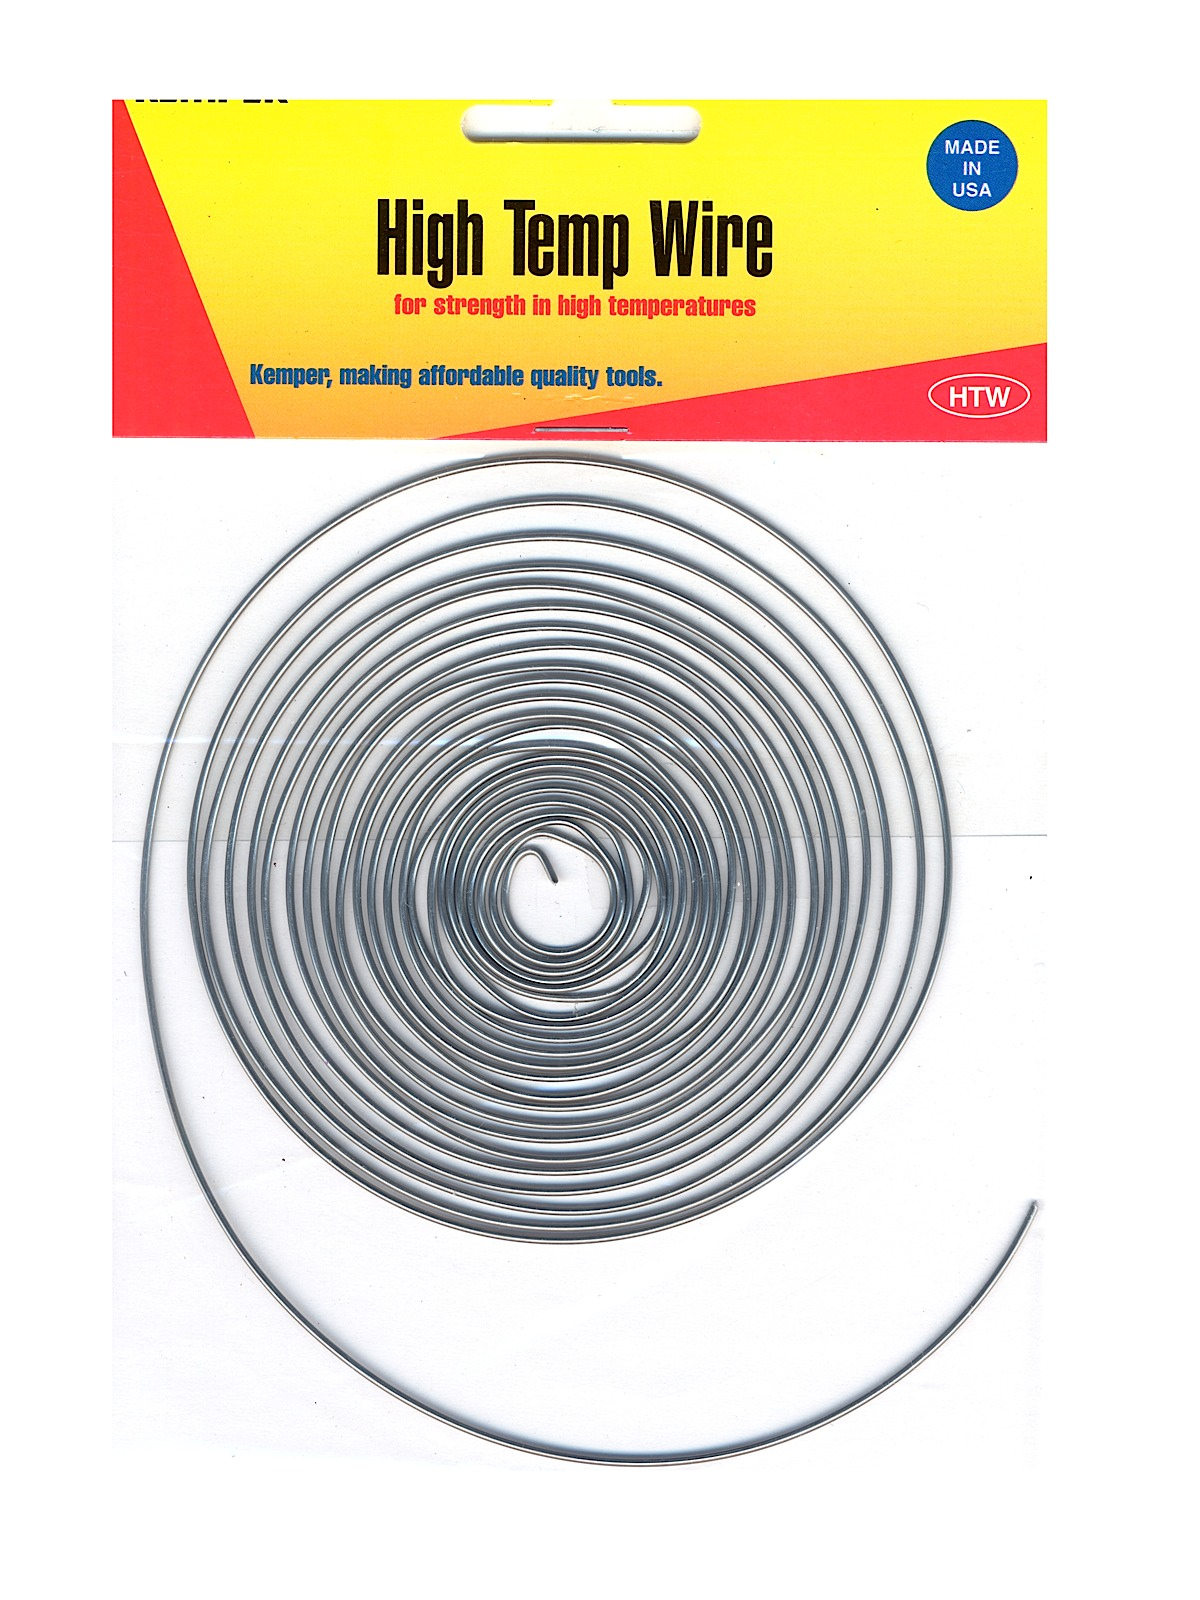 Kemper High Temp Wire | MisterArt.com